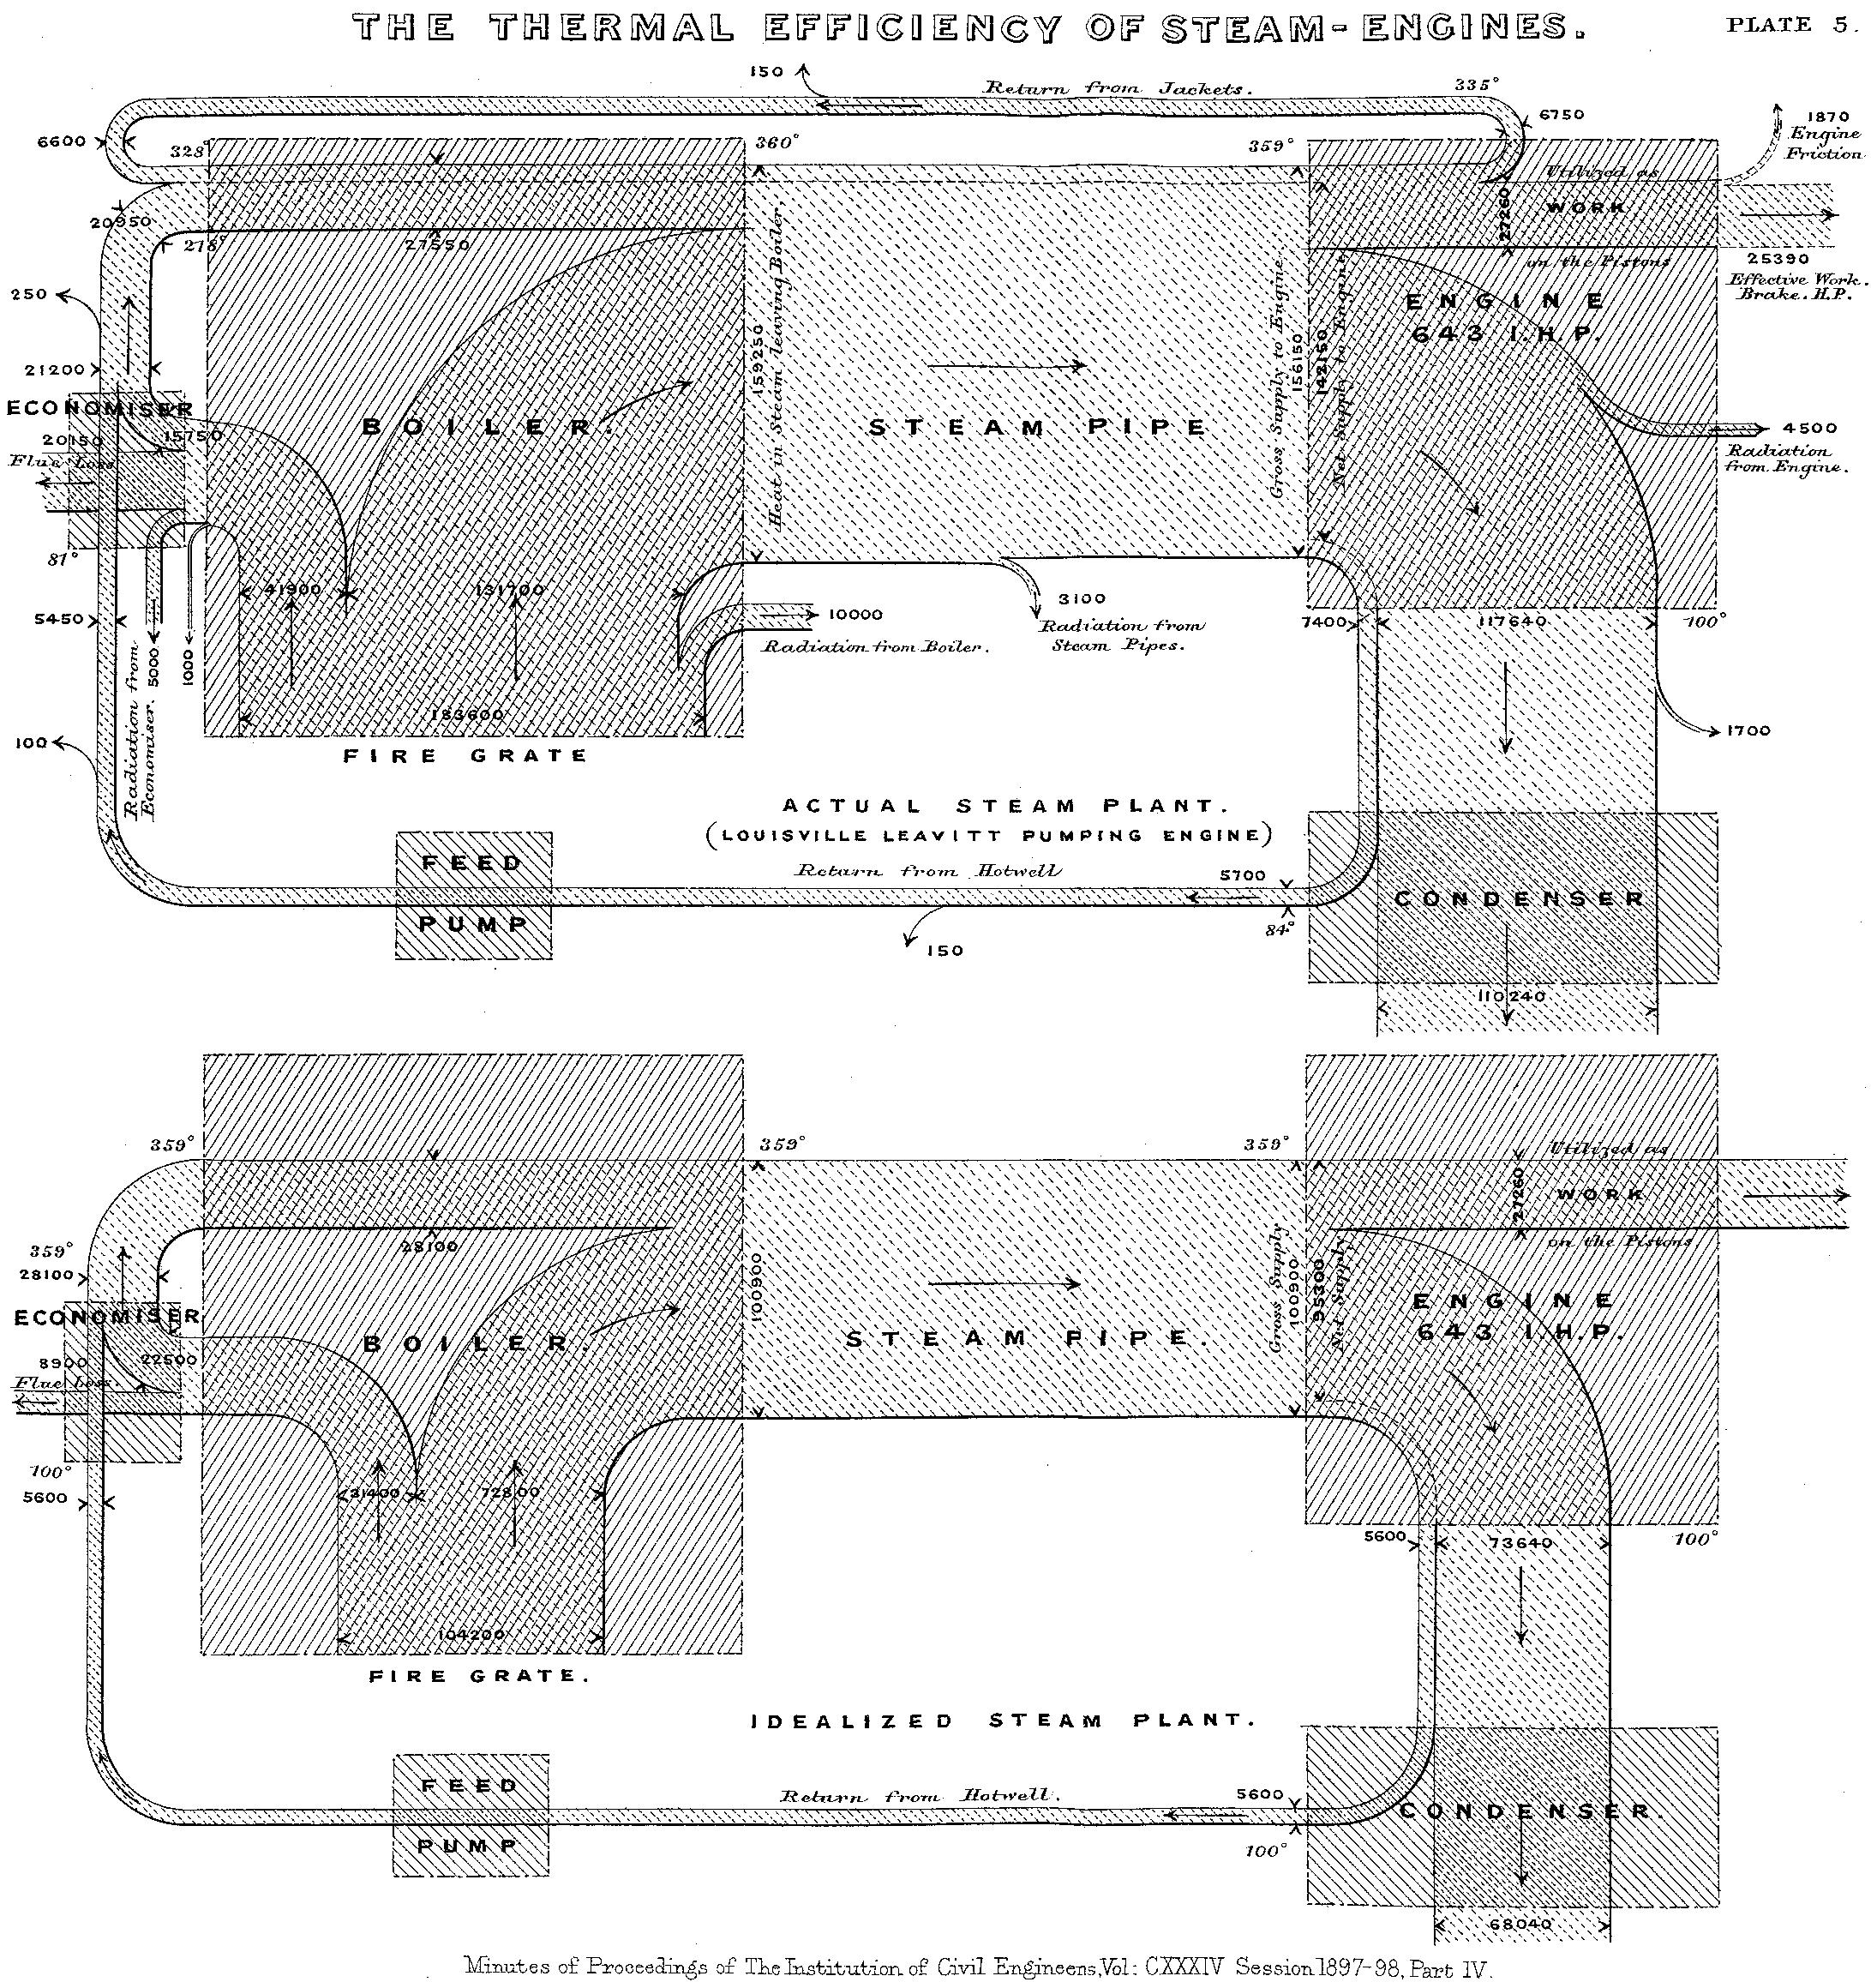 Figure 1. Sankey diagram Źródło grafiki: Wikipedia (https://pl.wikipedia.org/wiki/Plik:JIE_Sankey_V5_Fig1.png).